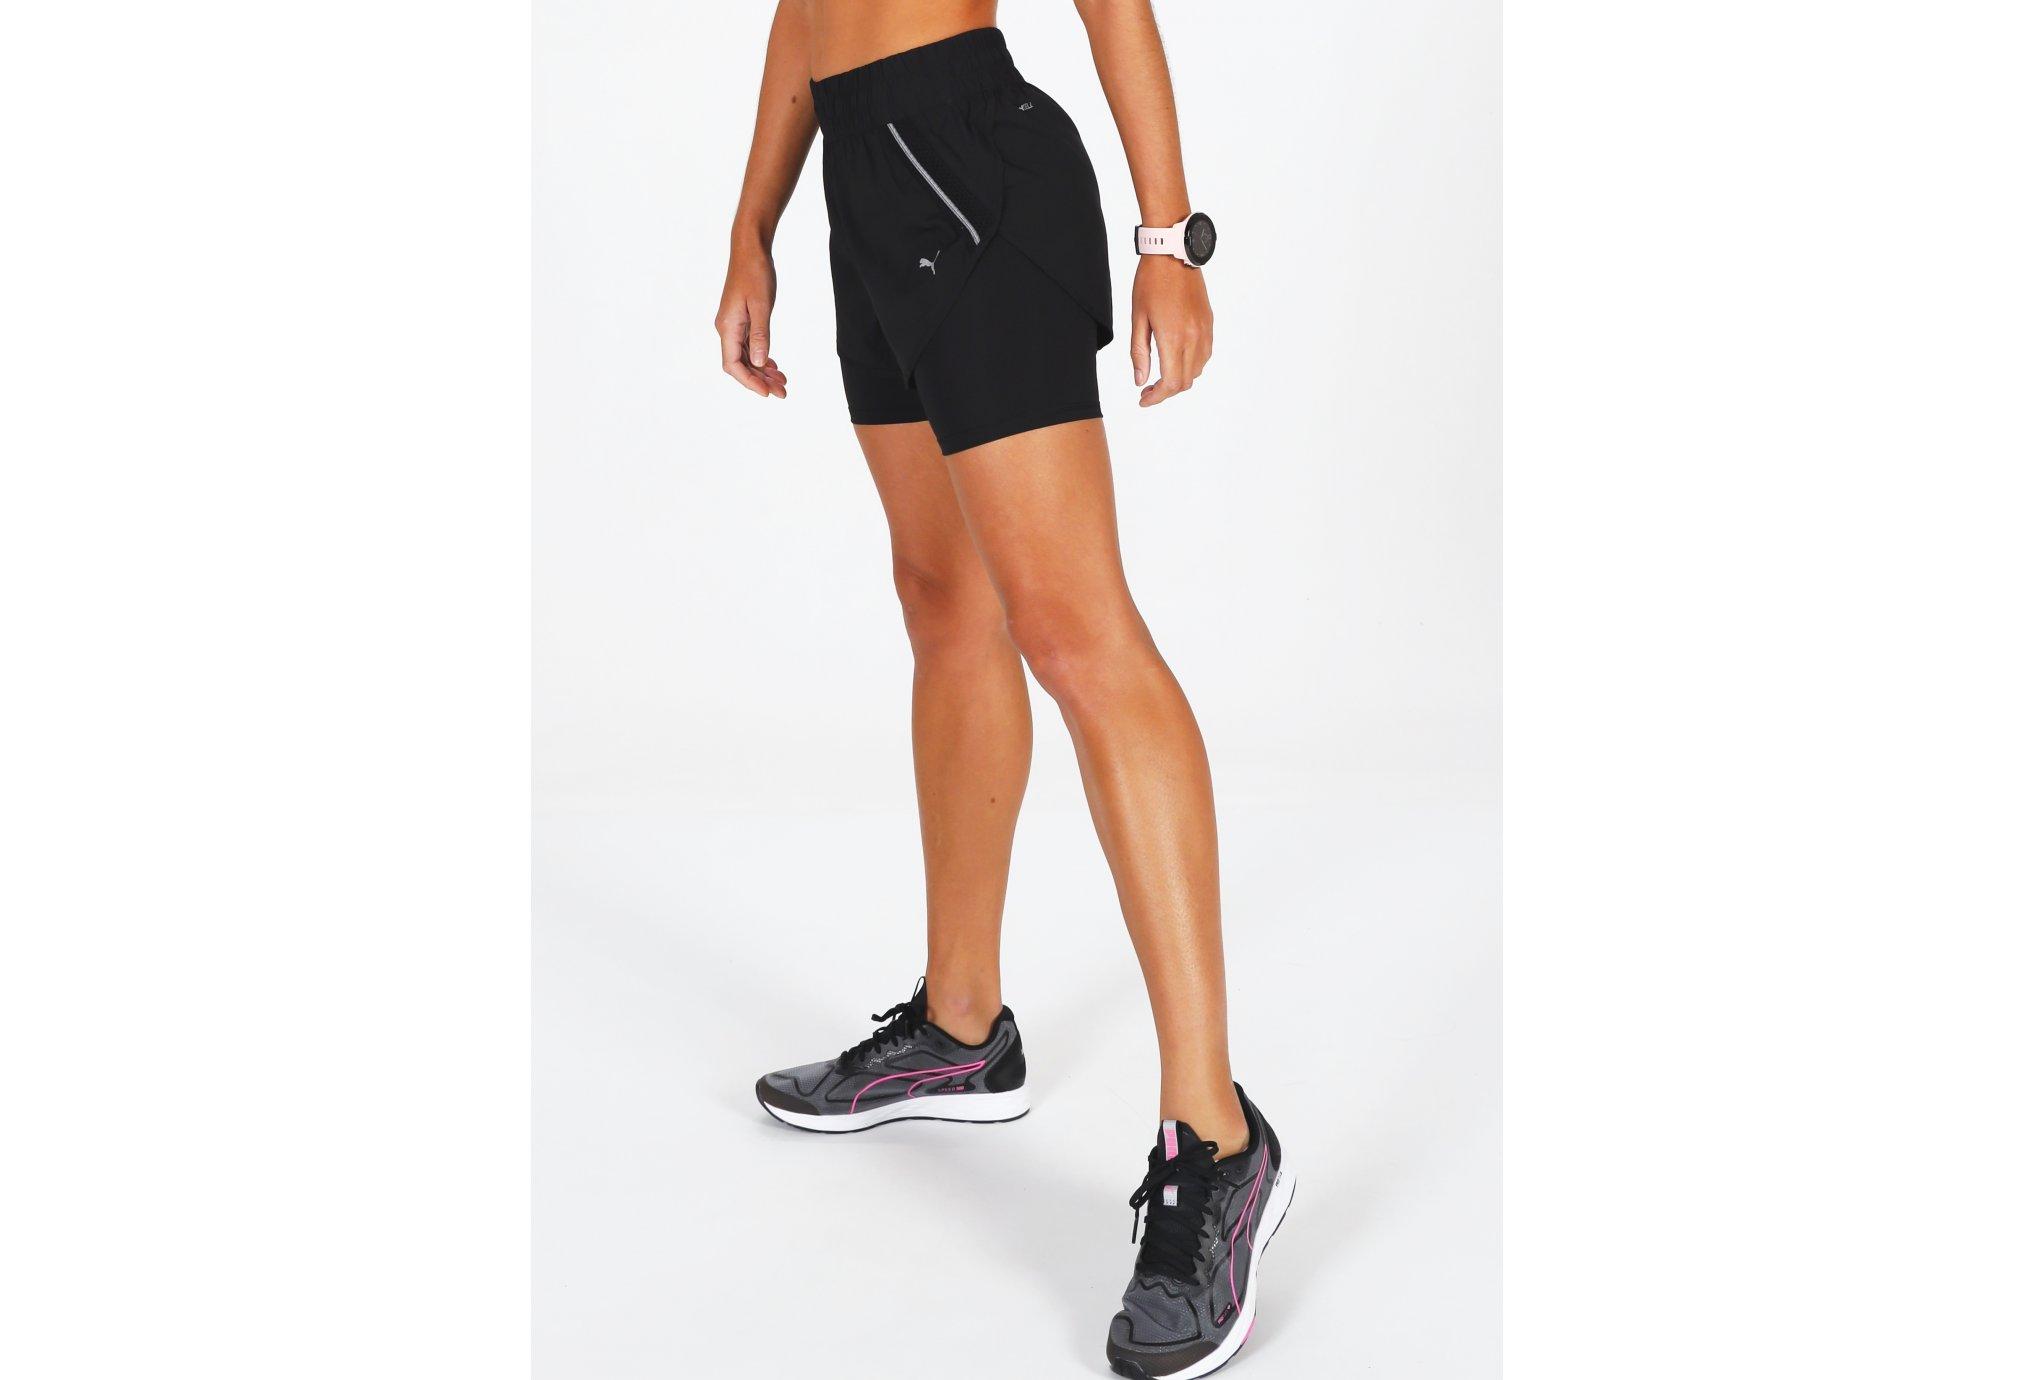 Puma Last Lap 2 en 1 W vêtement running femme